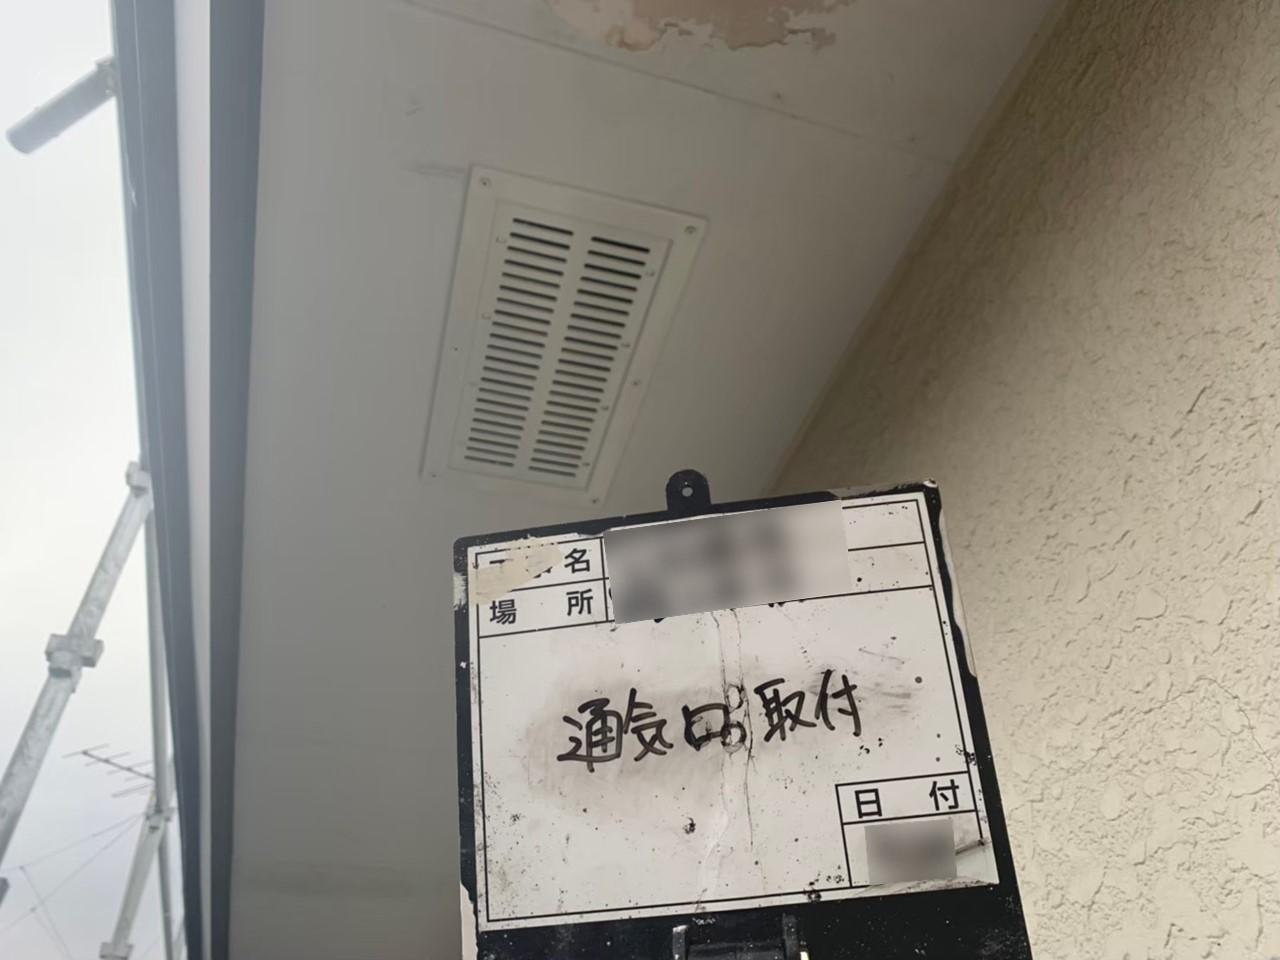 【施工完了報告!】東京都練馬区で屋根の塗装&通気口取り付け完了!